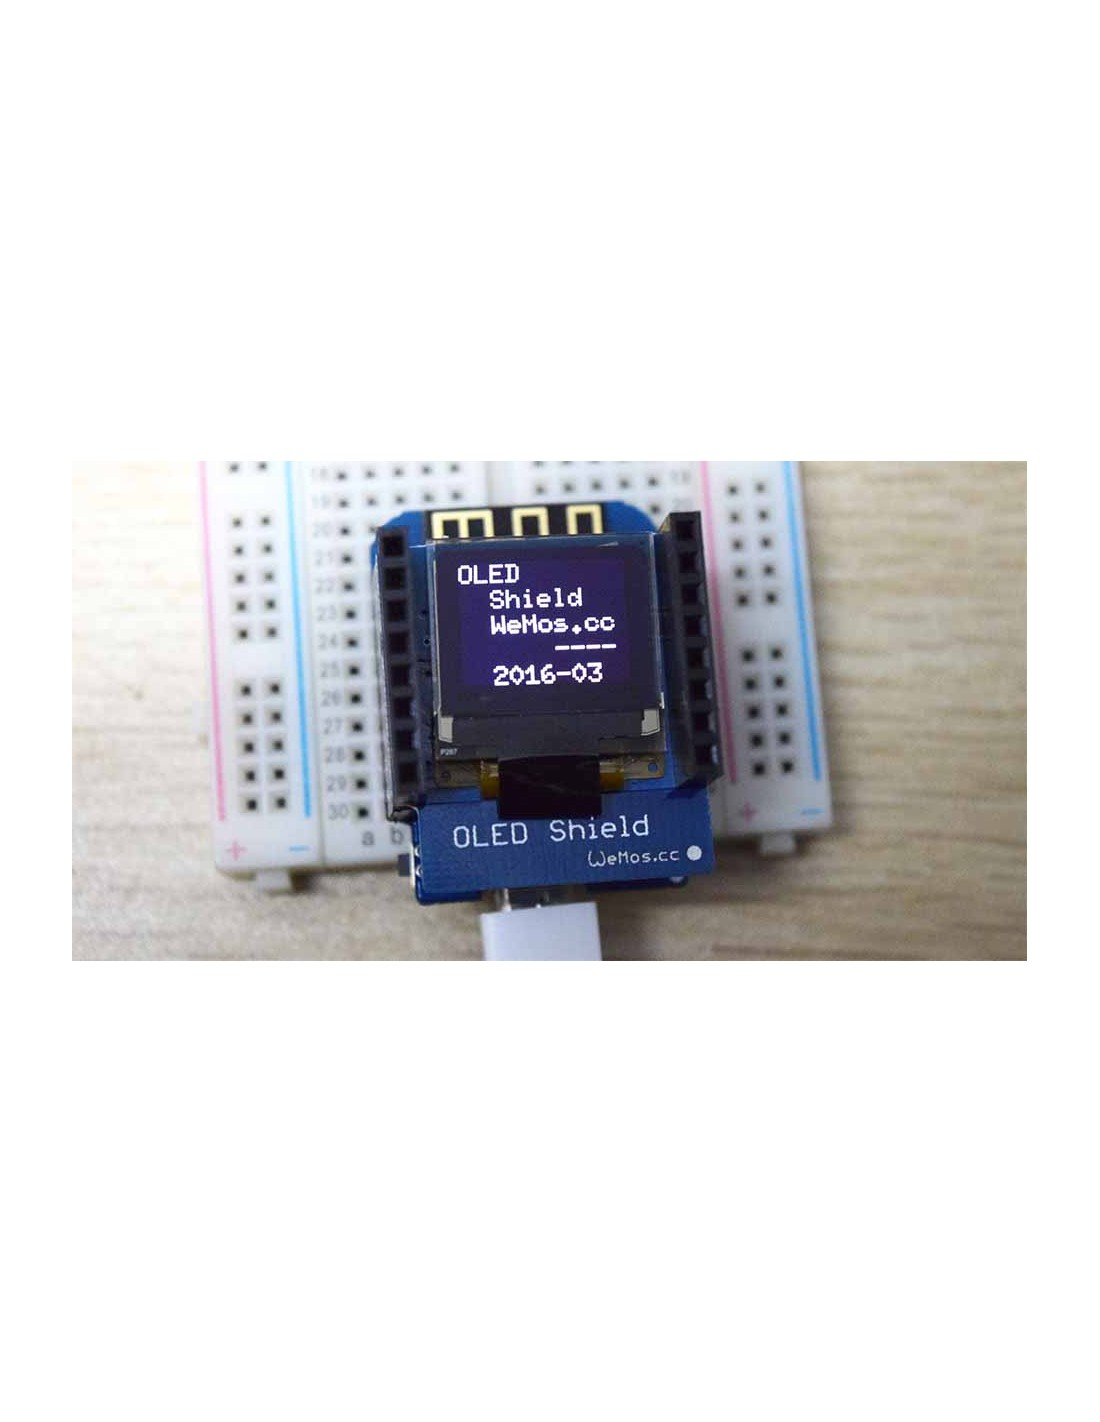 OLED Shield - (Wemos D1 Mini)